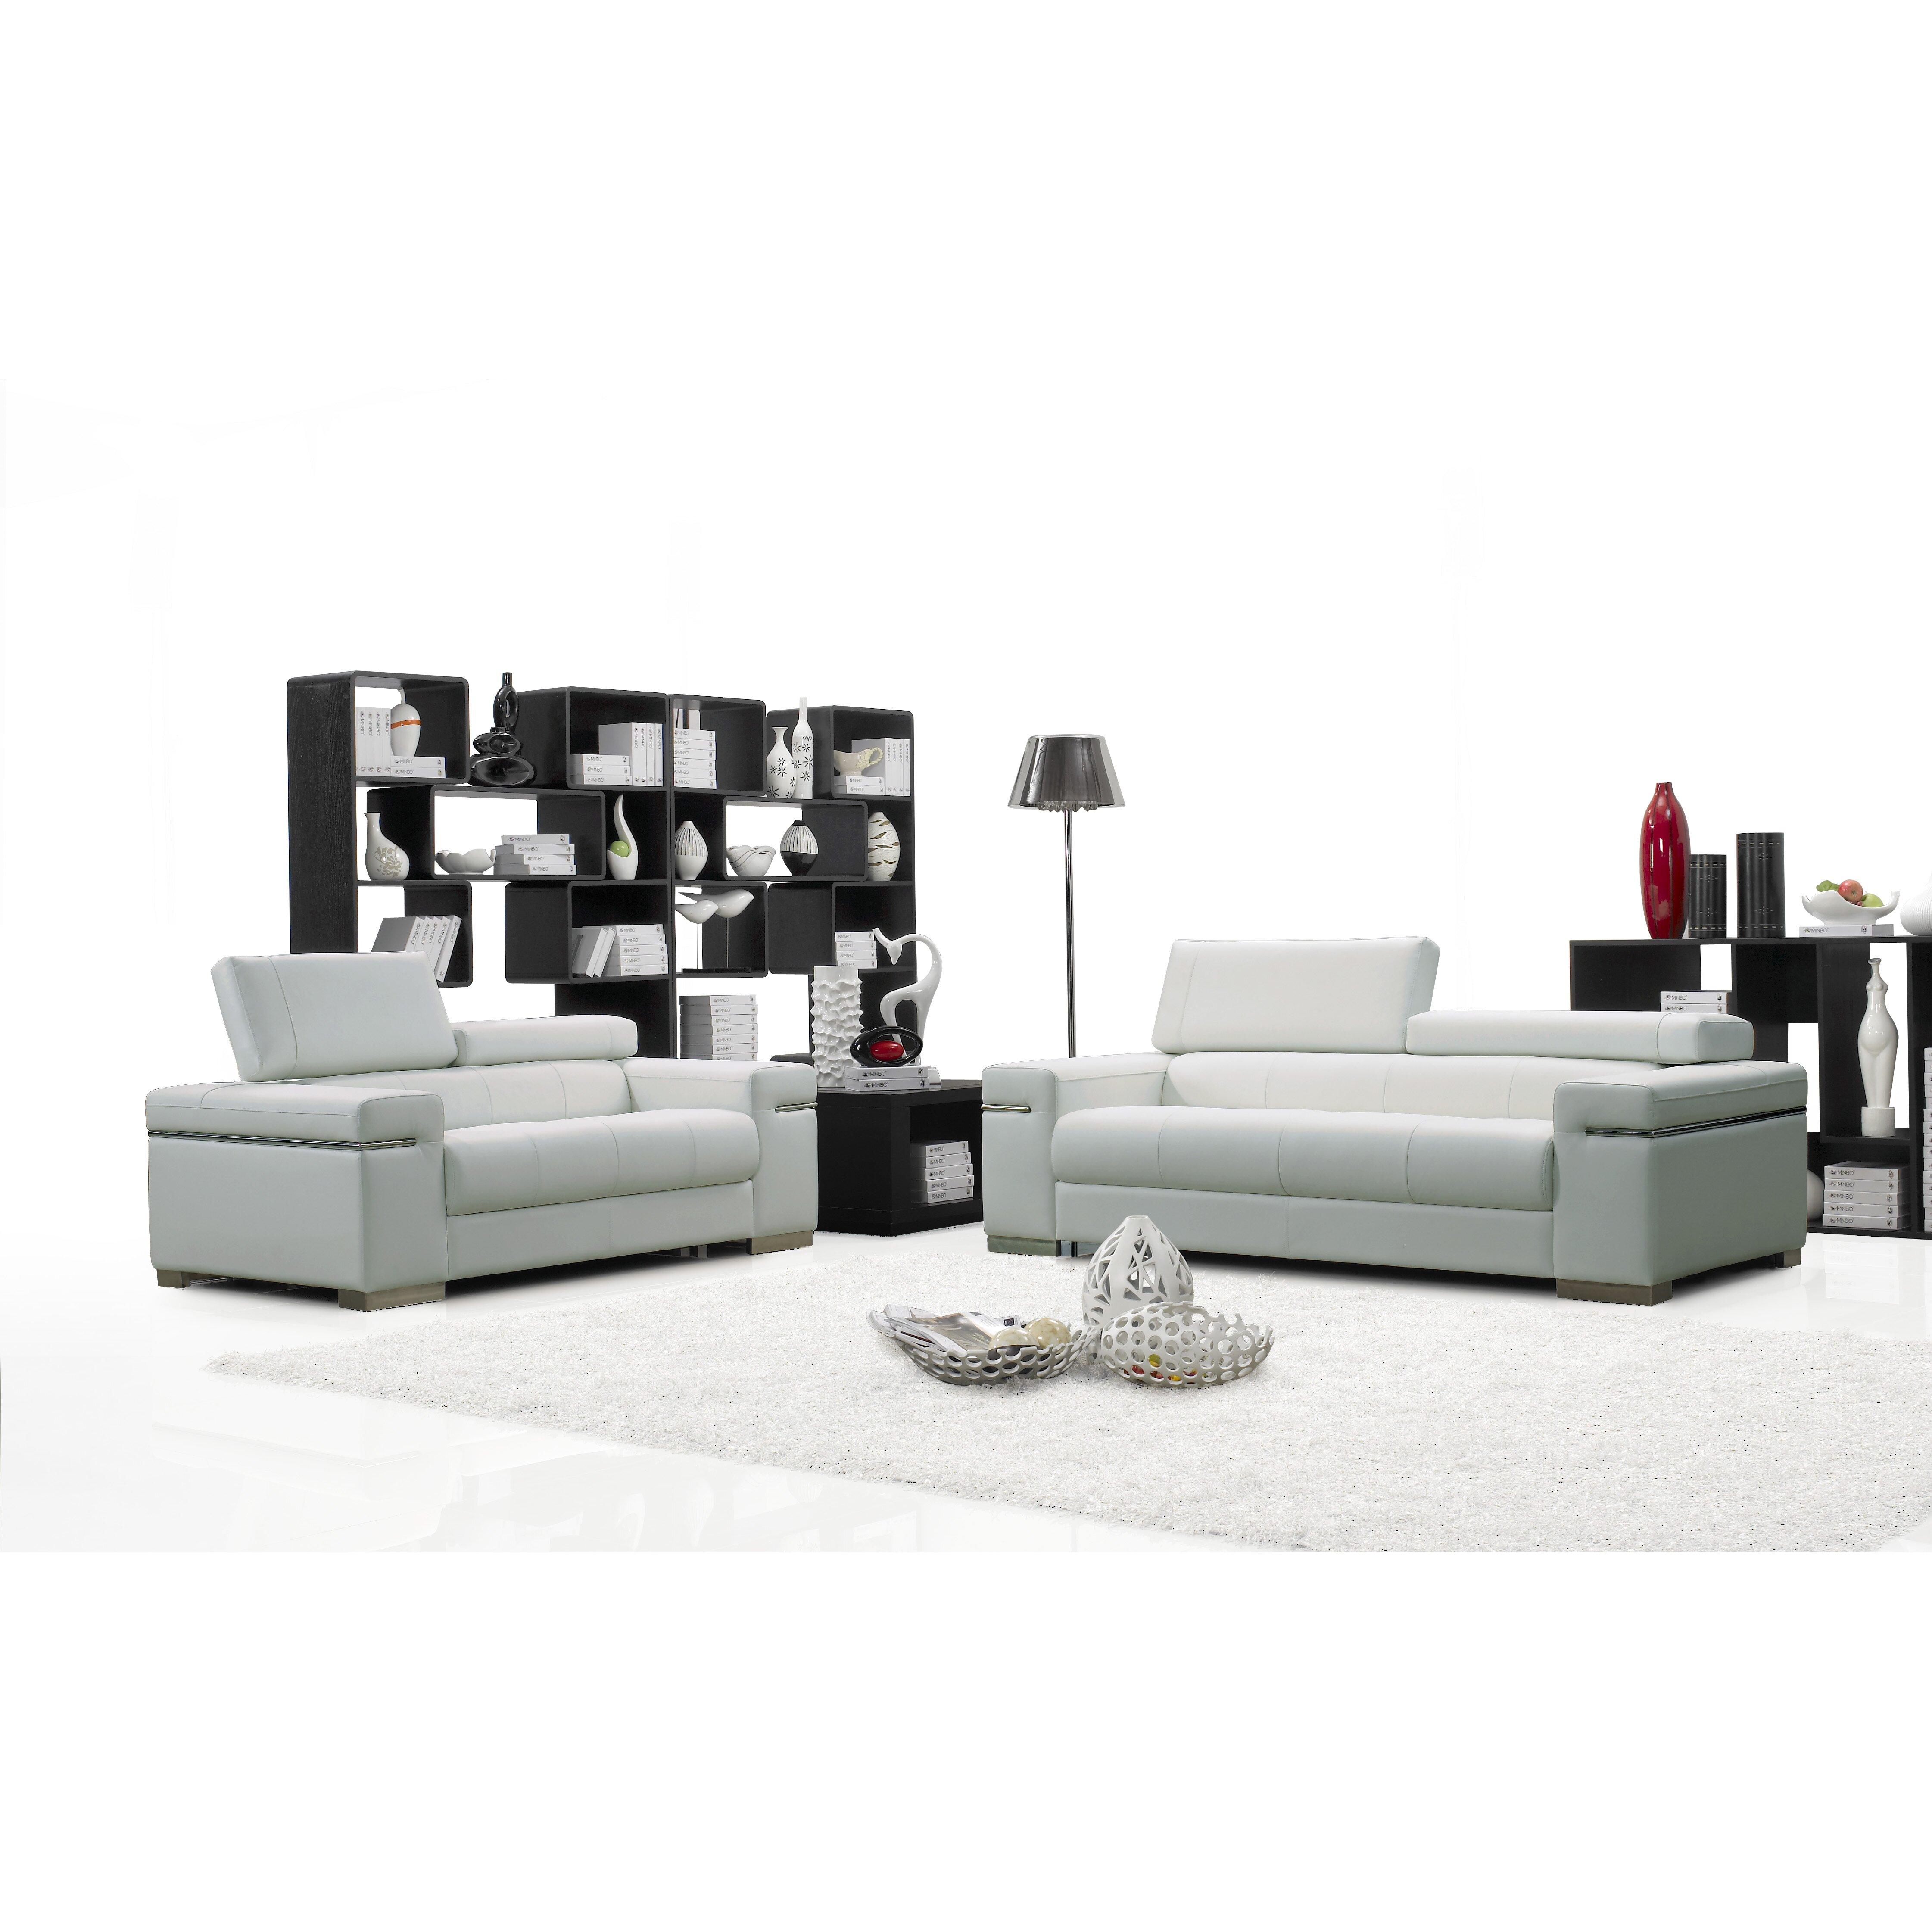 Living Room Furniture Orlando Fl modern living room furniture dallas tx orlando fl buy living room